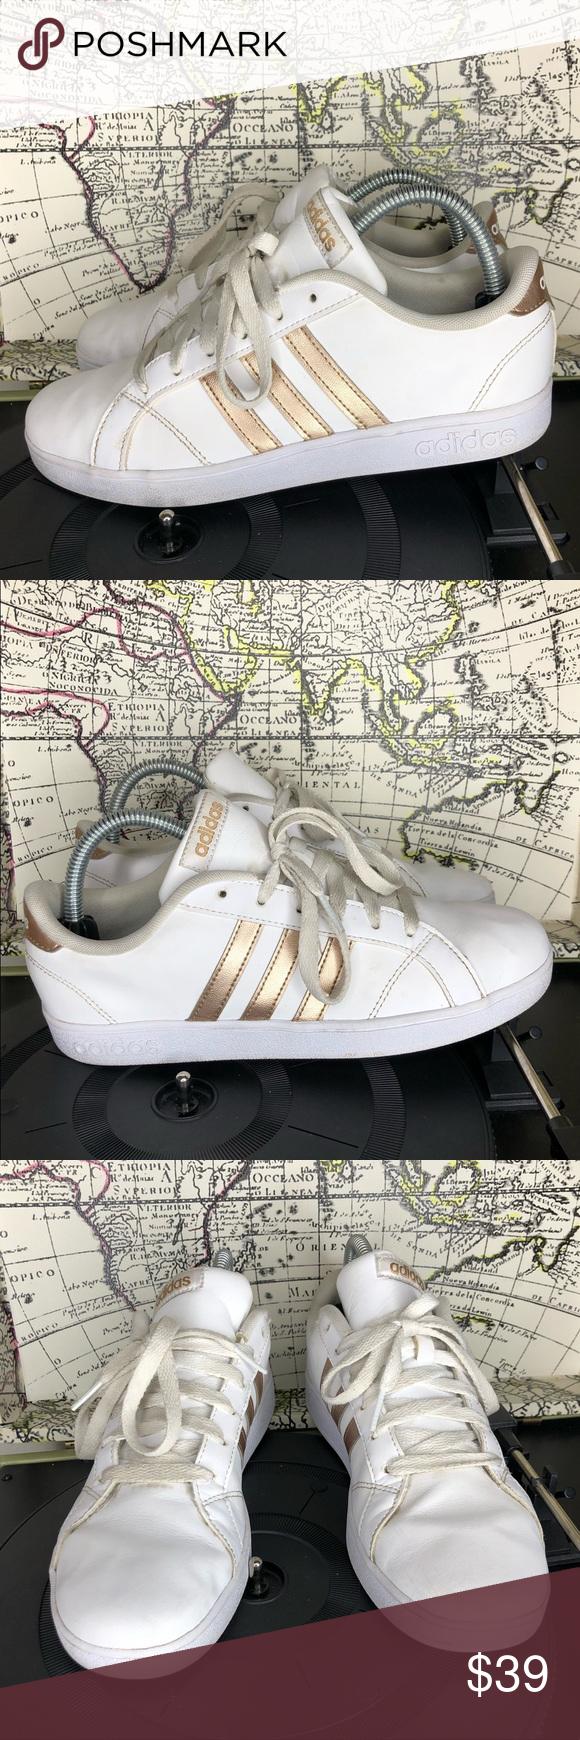 Adidas baseline, Rose gold tennis shoes